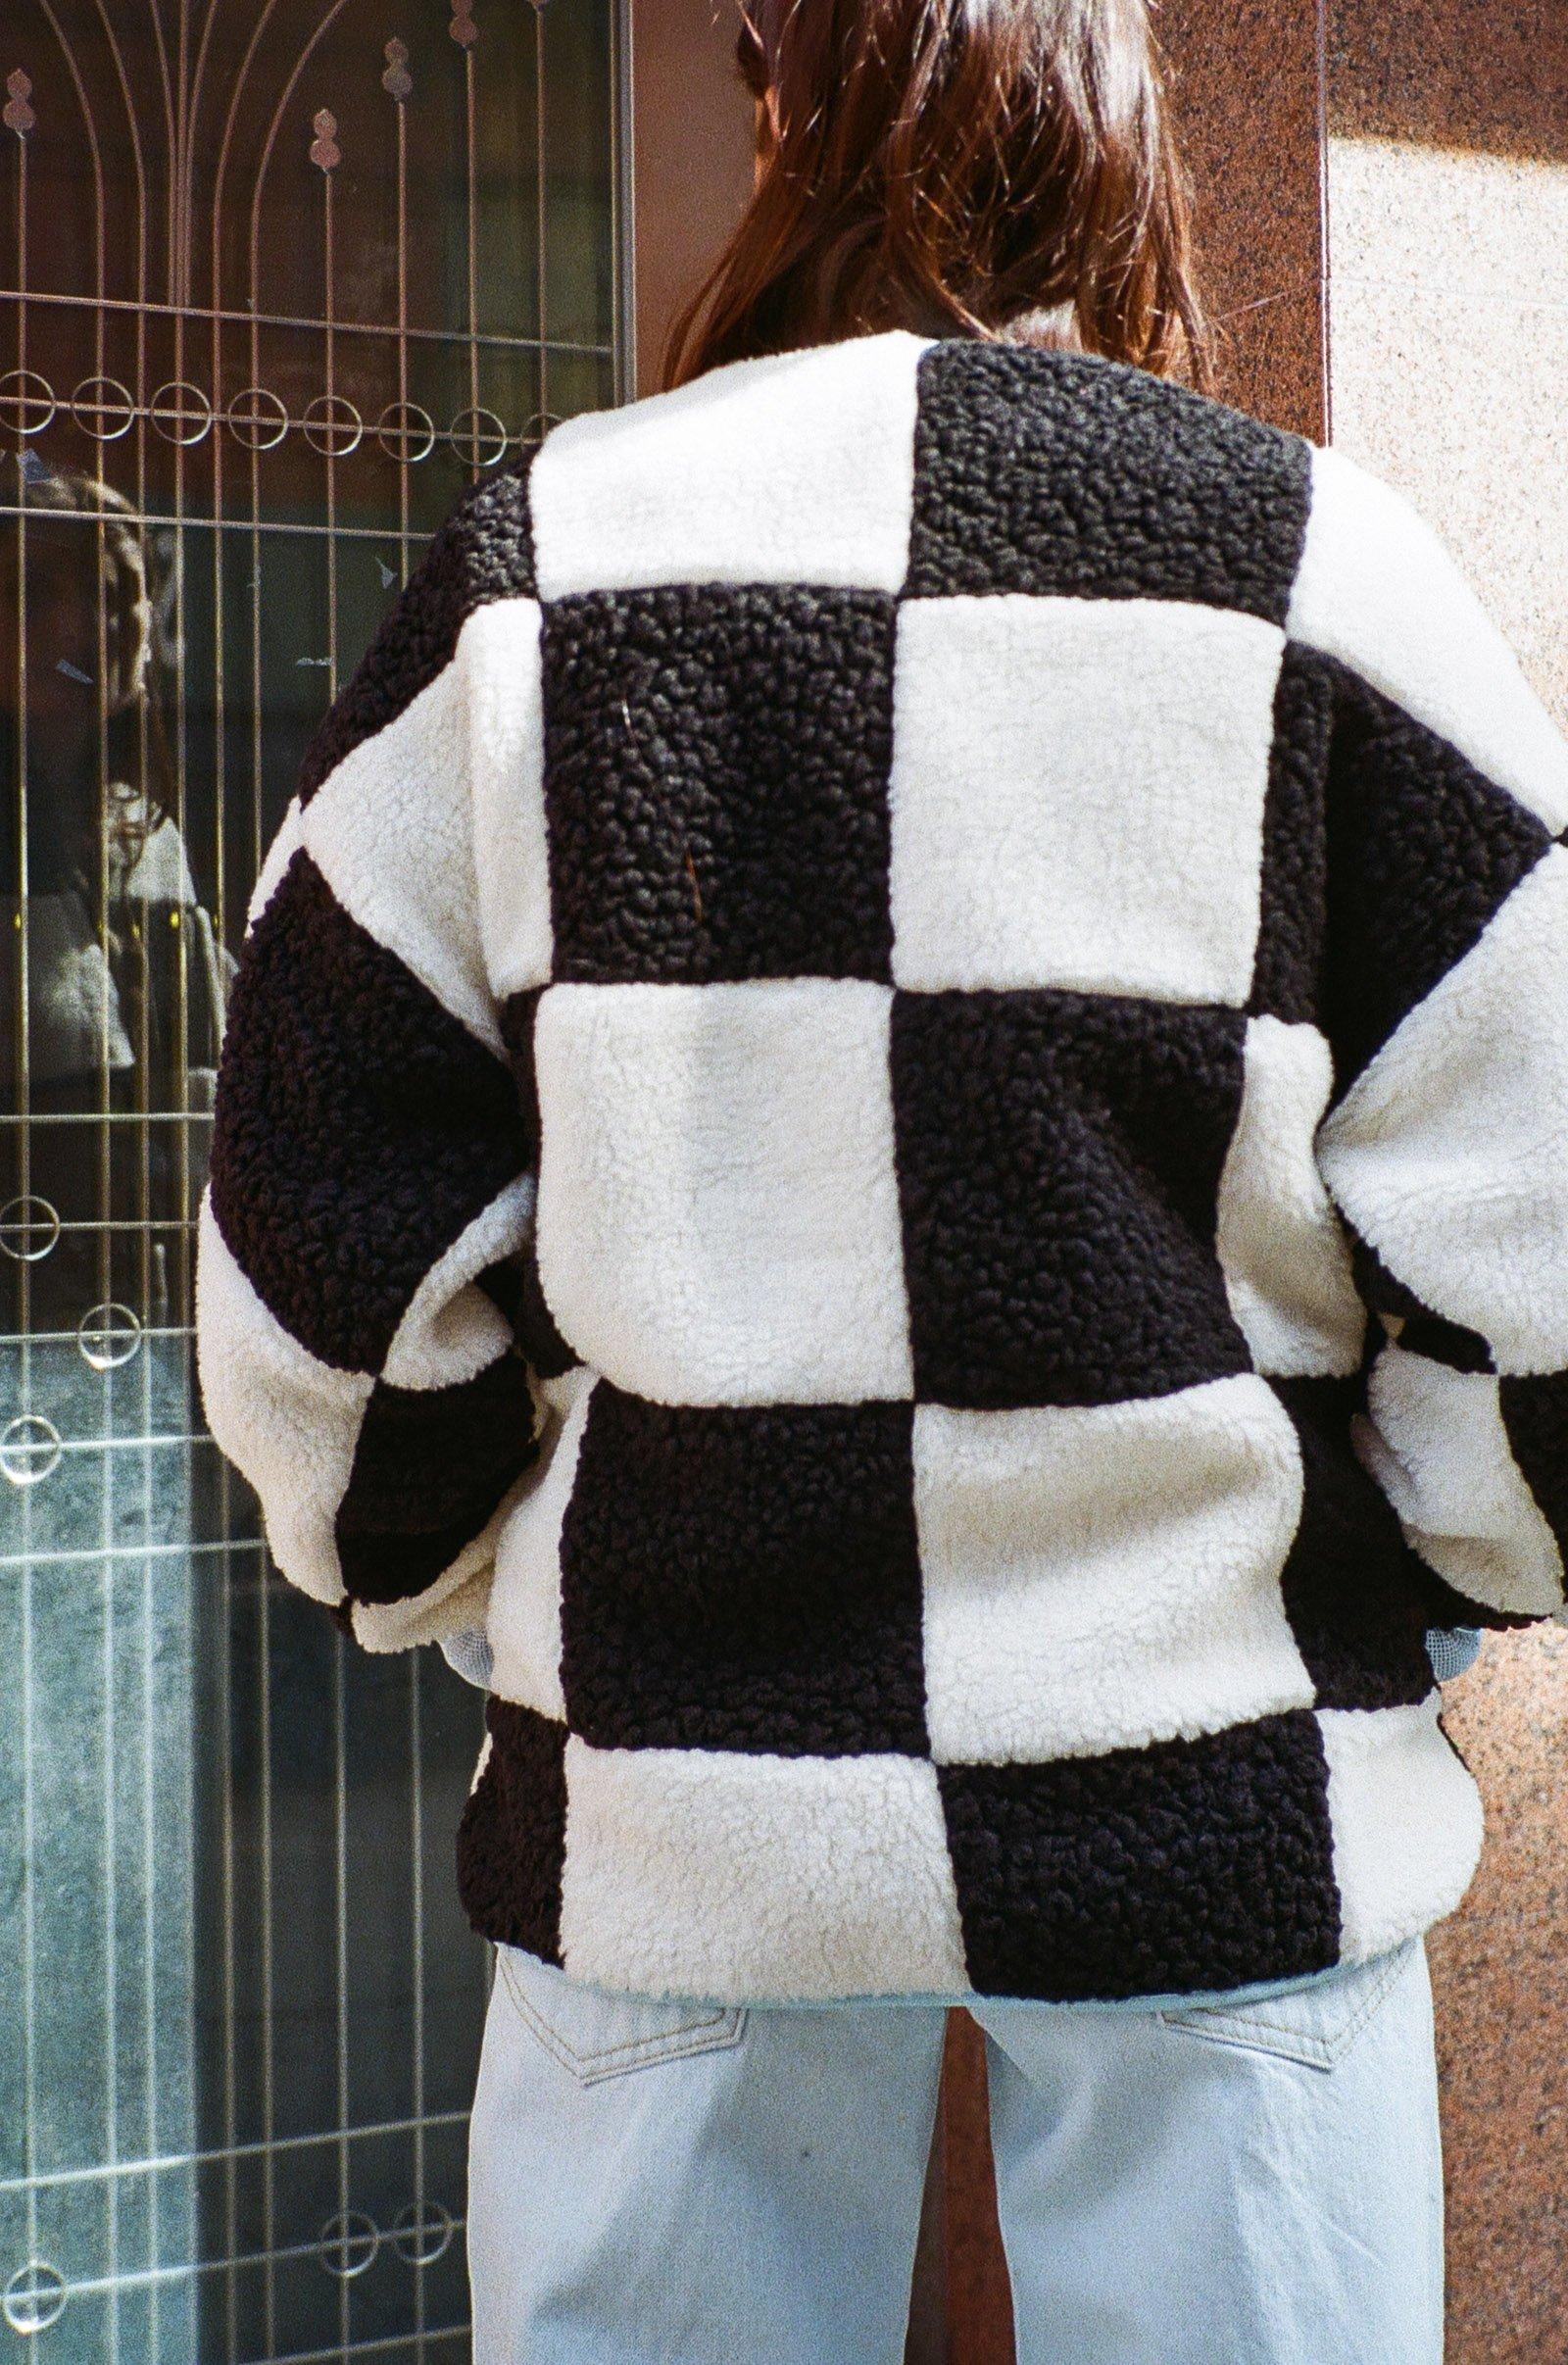 Pawn Fleece by Sandy Liang - 5